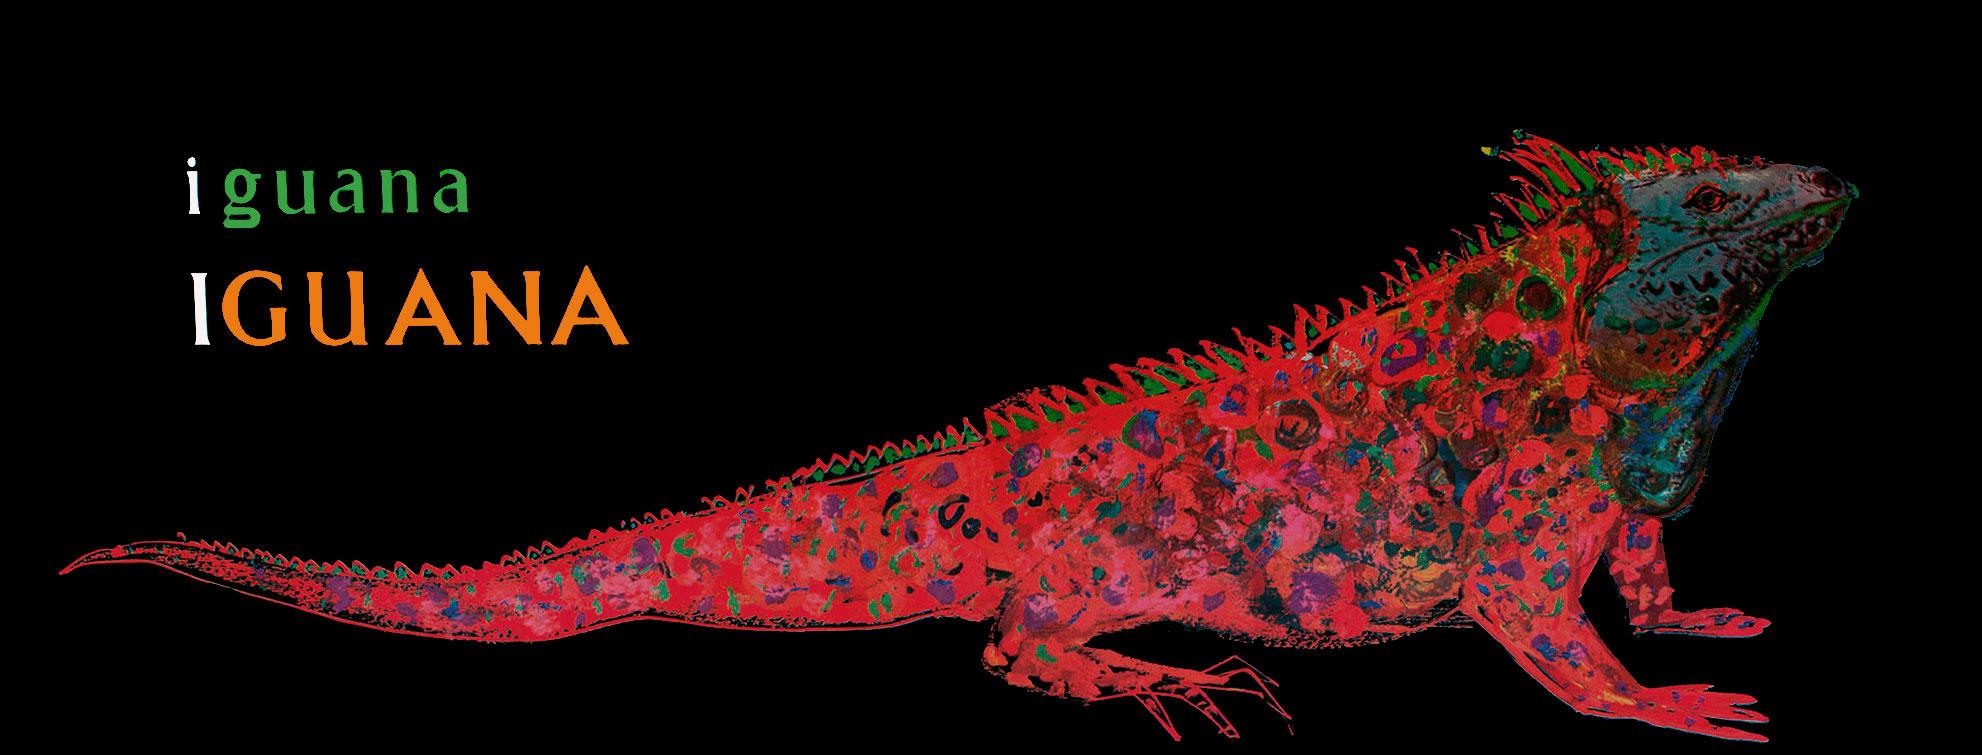 i-for-iguana-from-brian-wildsmith-ABC.jpg